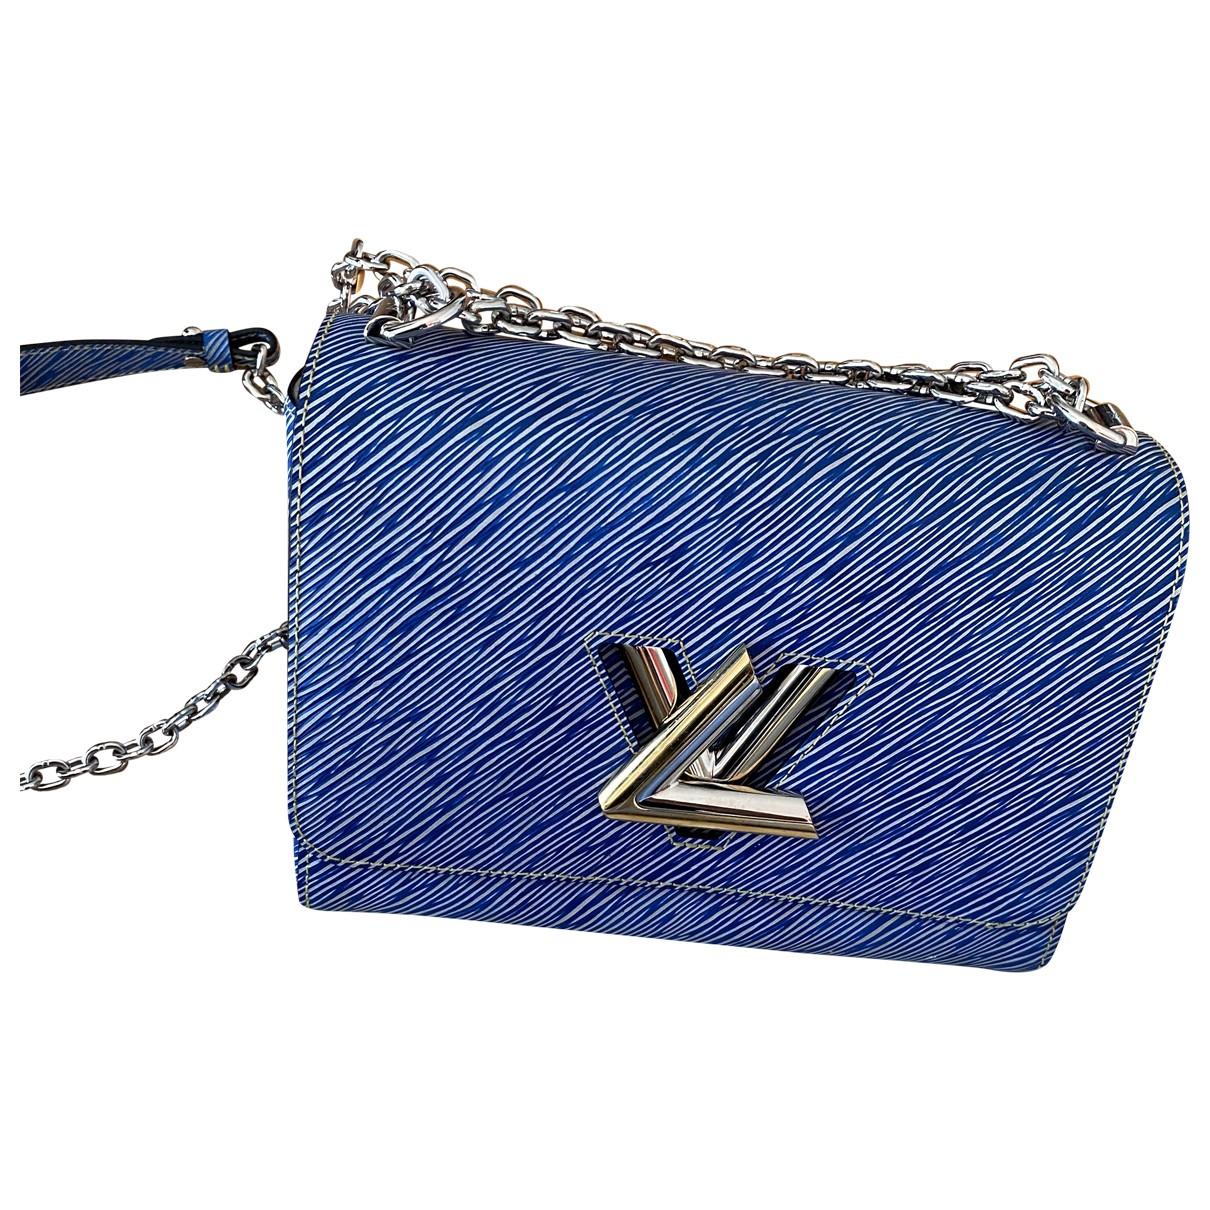 Bolso  Twist de Cuero Louis Vuitton